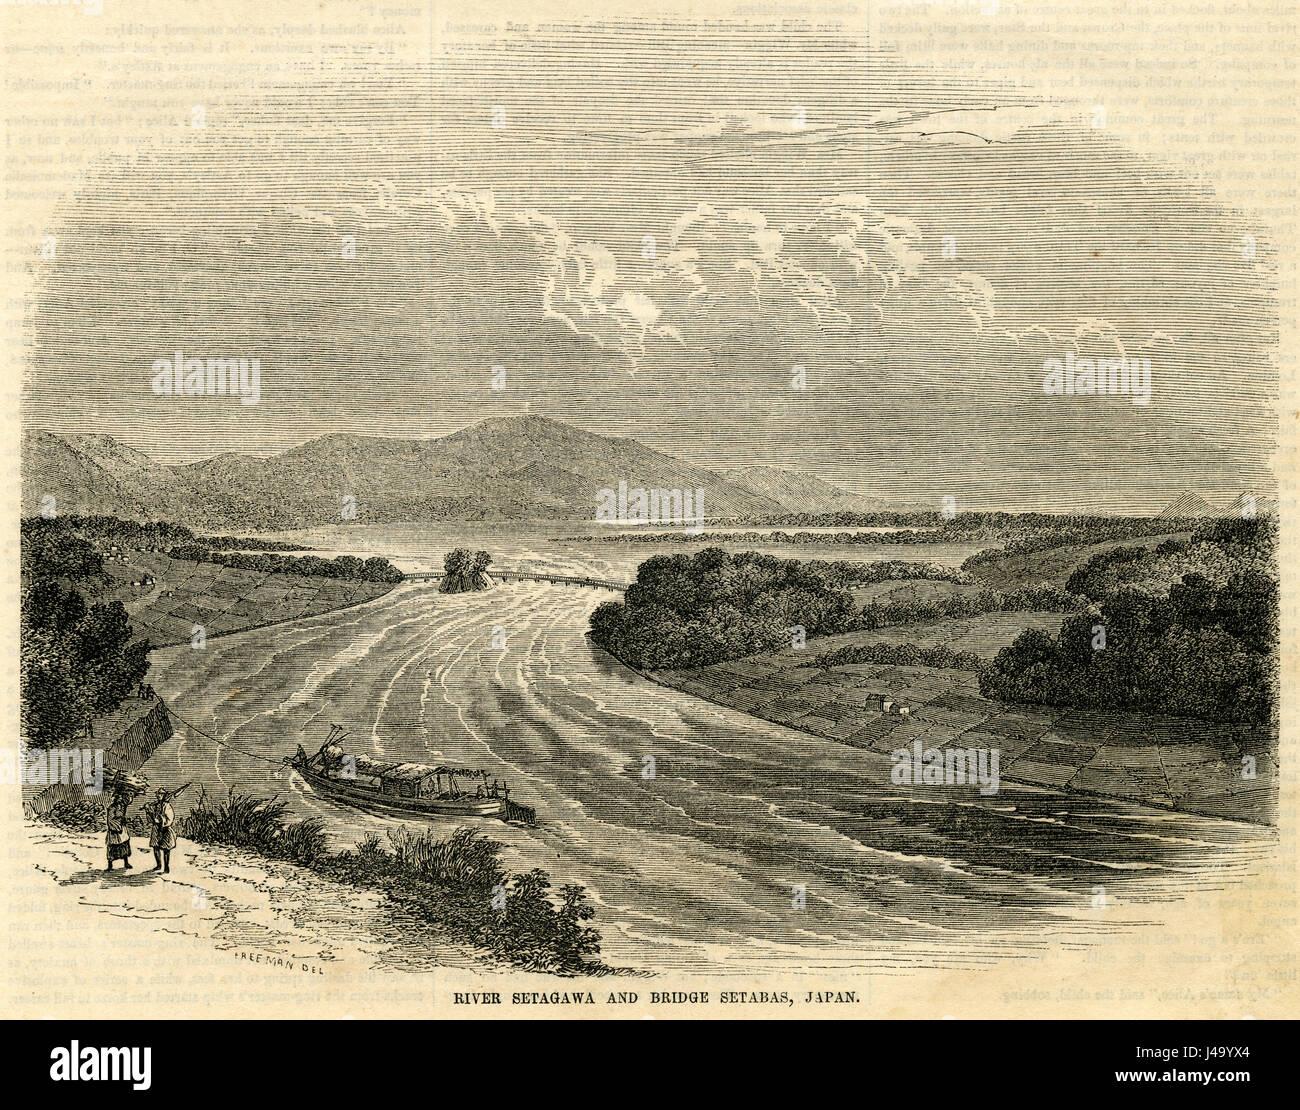 Antique 1854 engraving, River Seta-gawa and Long Bridge at Seta, Japan. The Yodo River, also called the Seta River - Stock Image